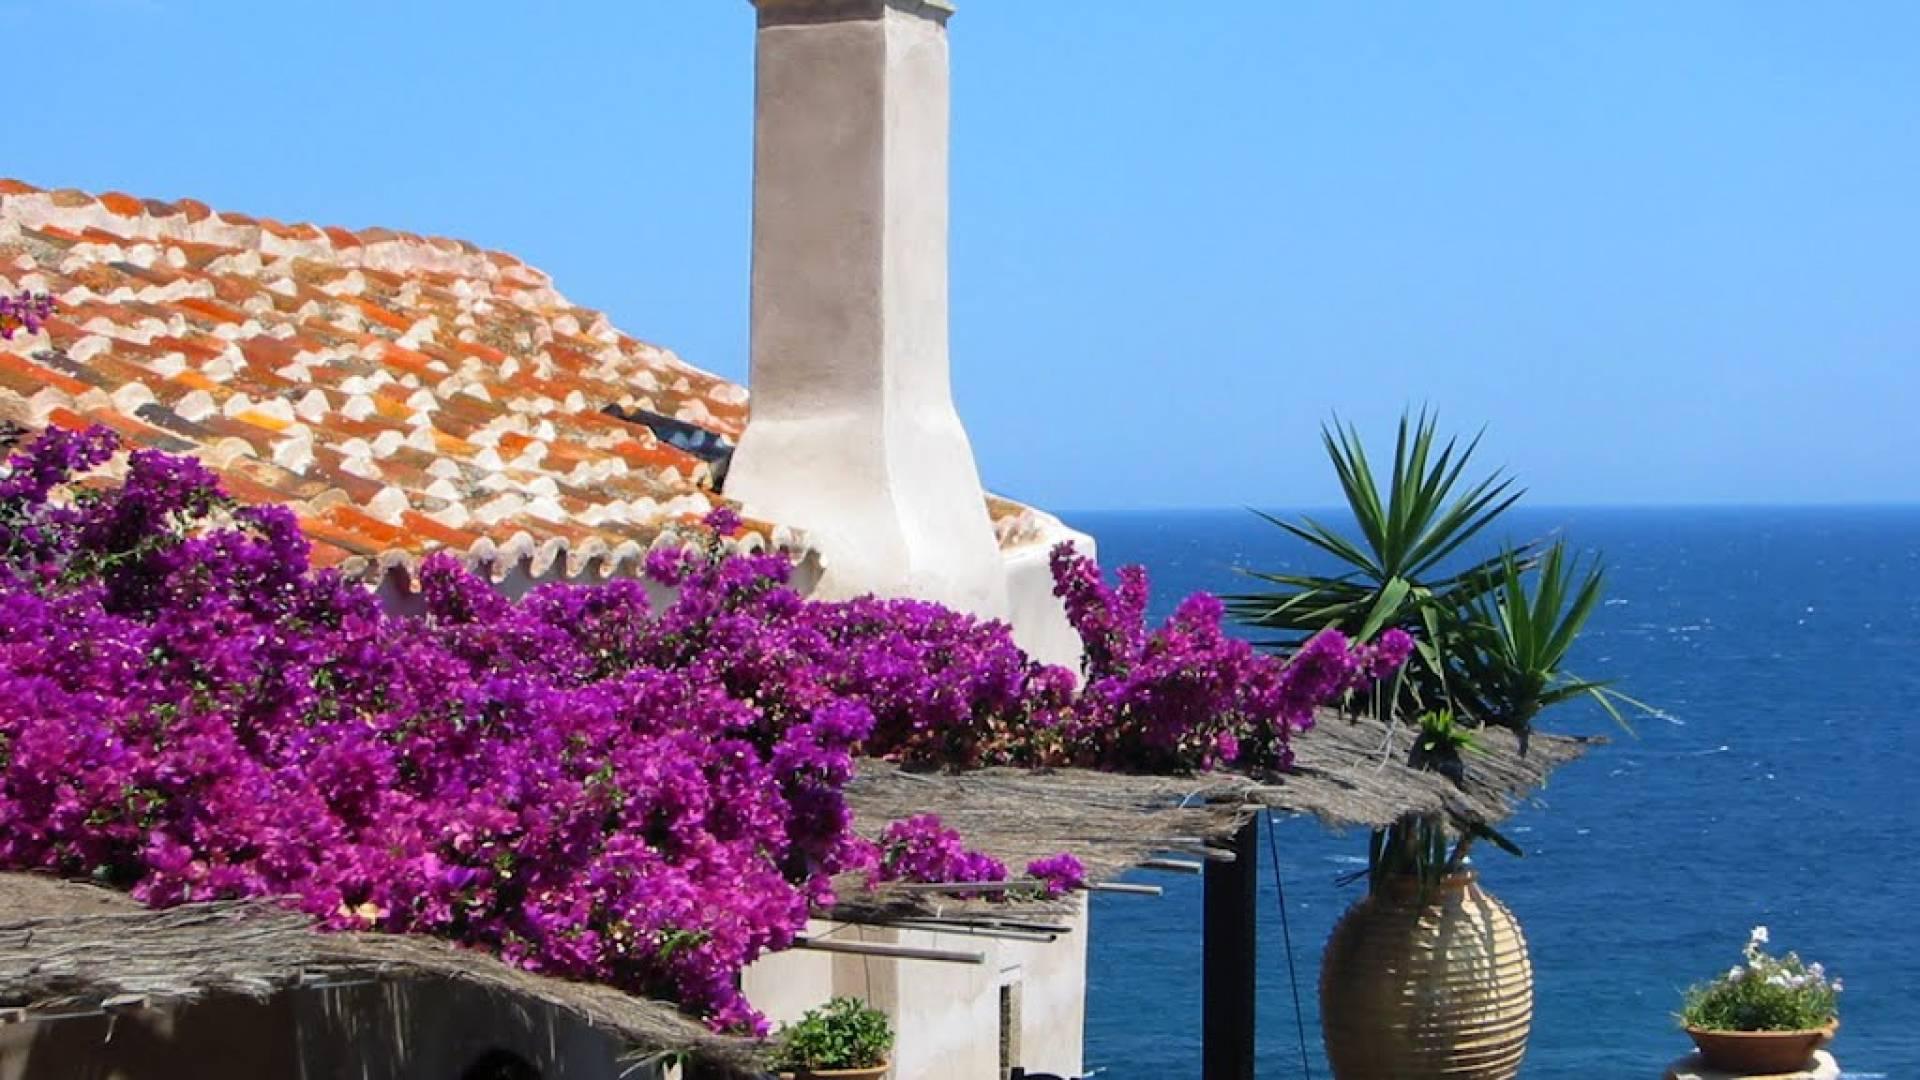 Monemvasia Greece island Yacht rent AA Chartercom 1920x1080